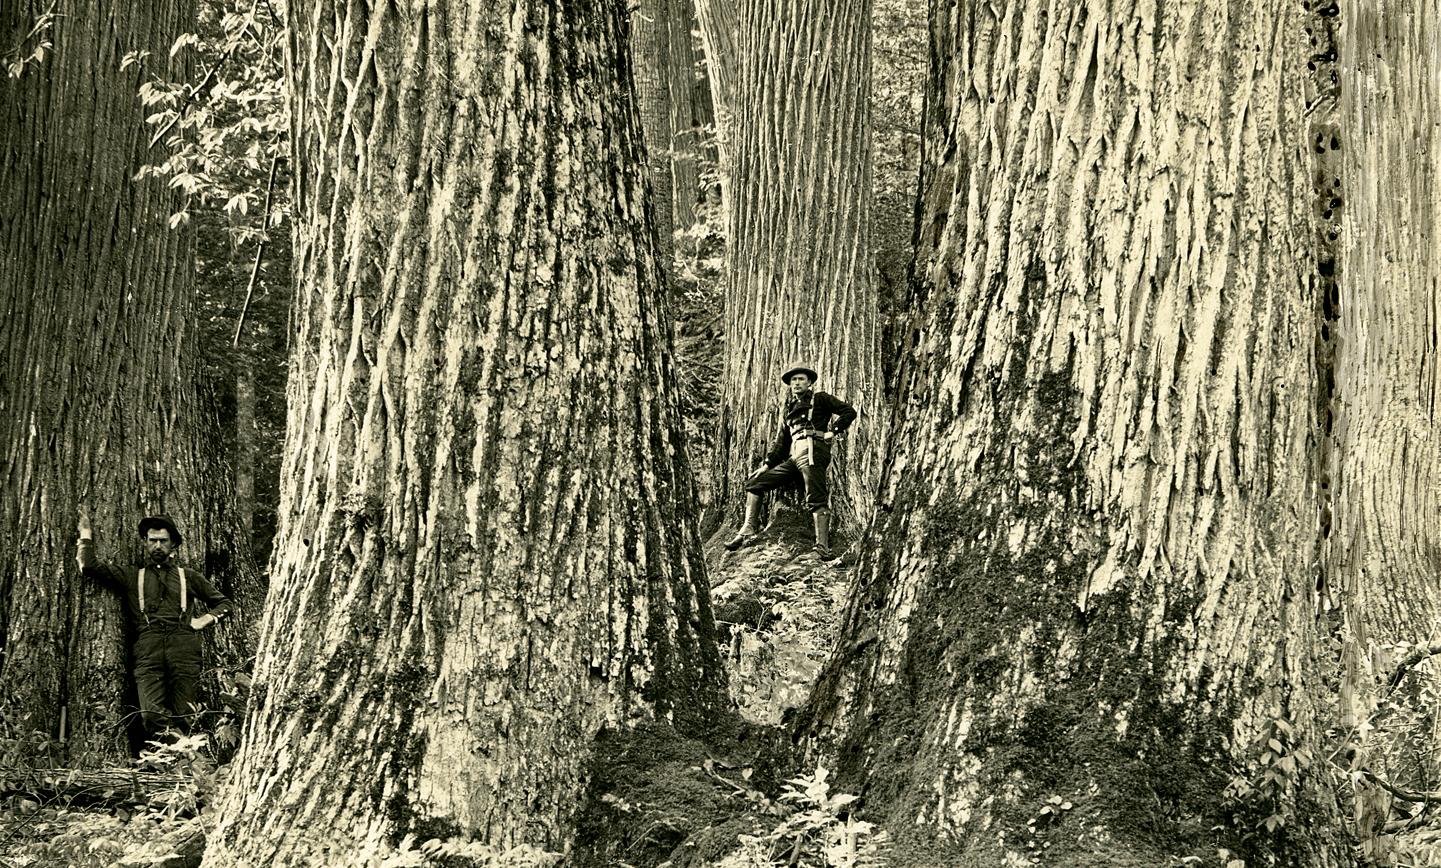 chestnut-cropped